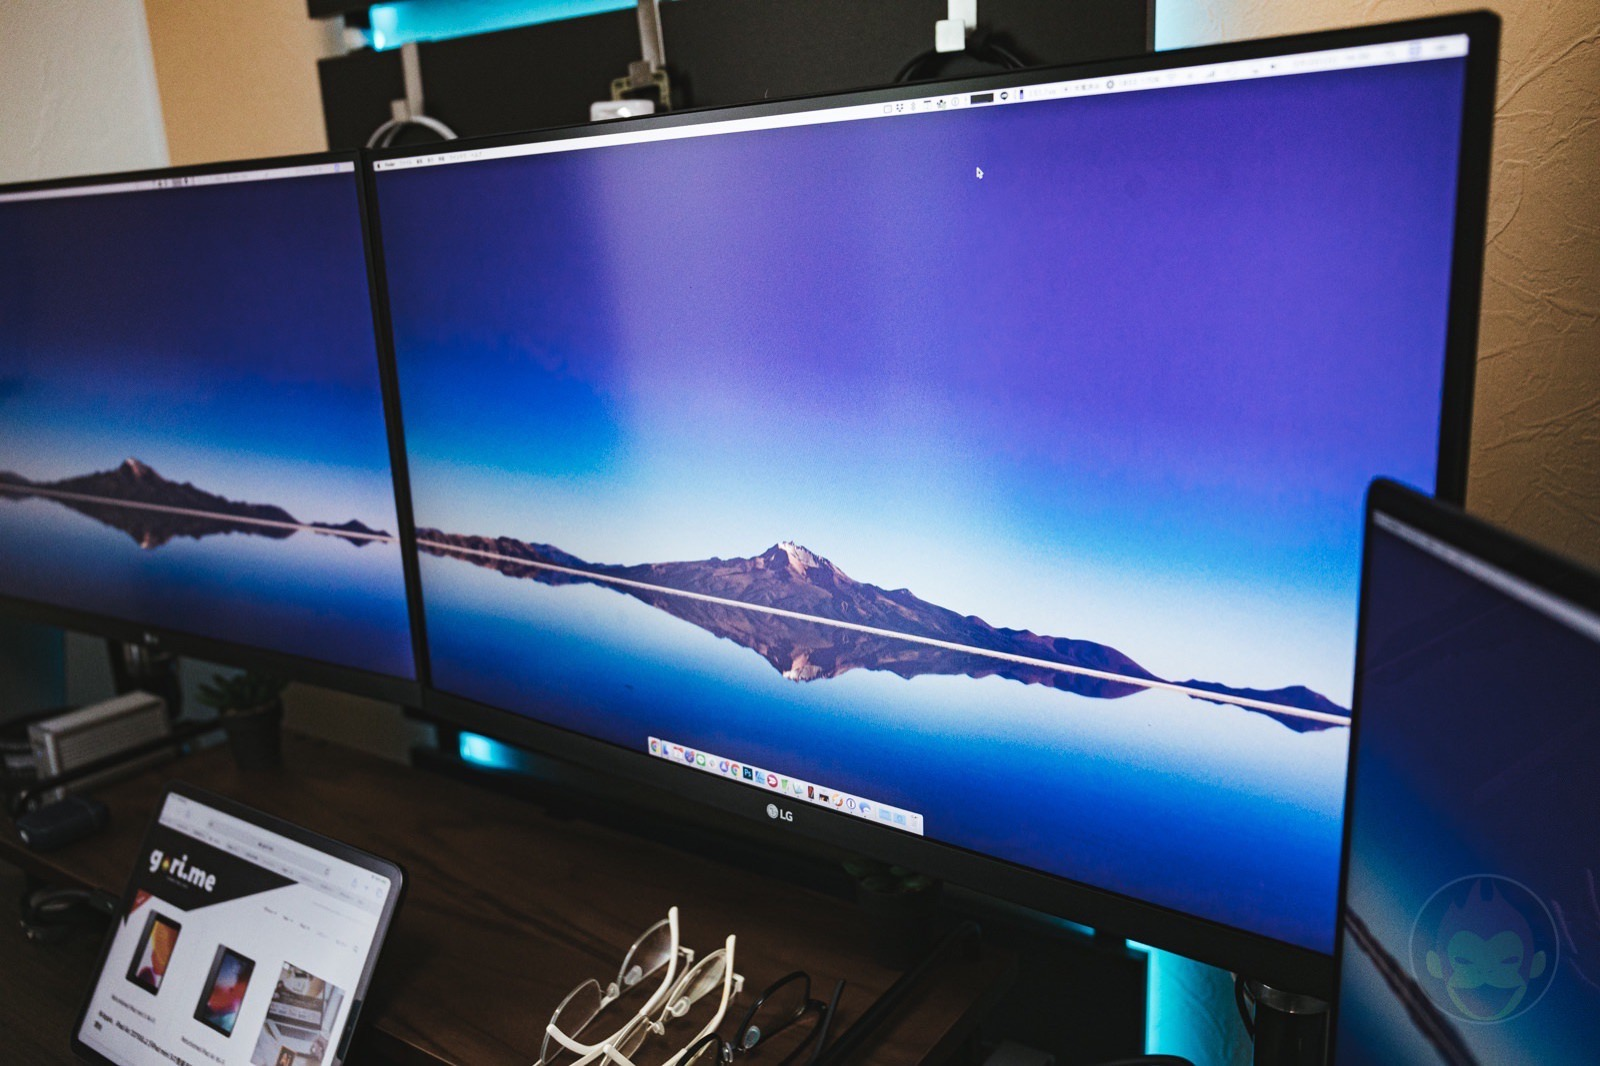 27UK650-W-4K-LG-Display-02.jpg